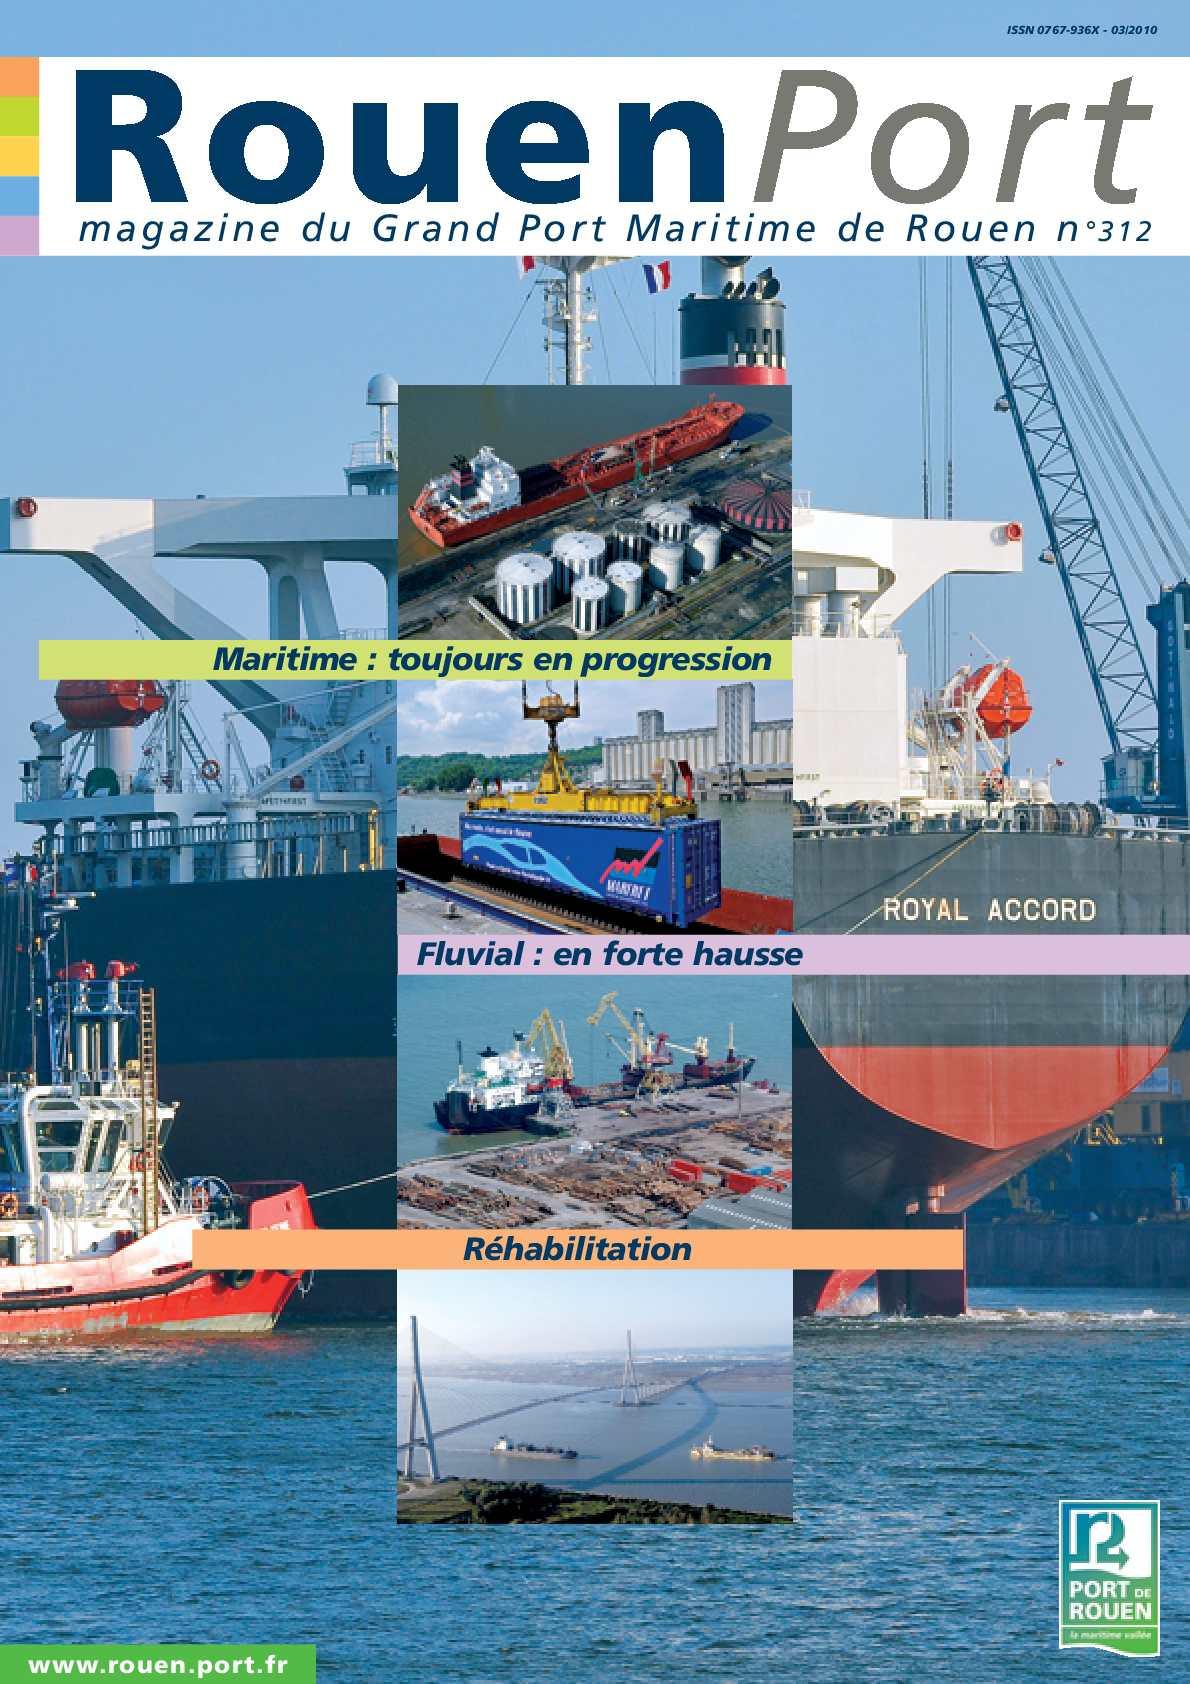 Calam o rouen port magazine - Grand port maritime de rouen ...